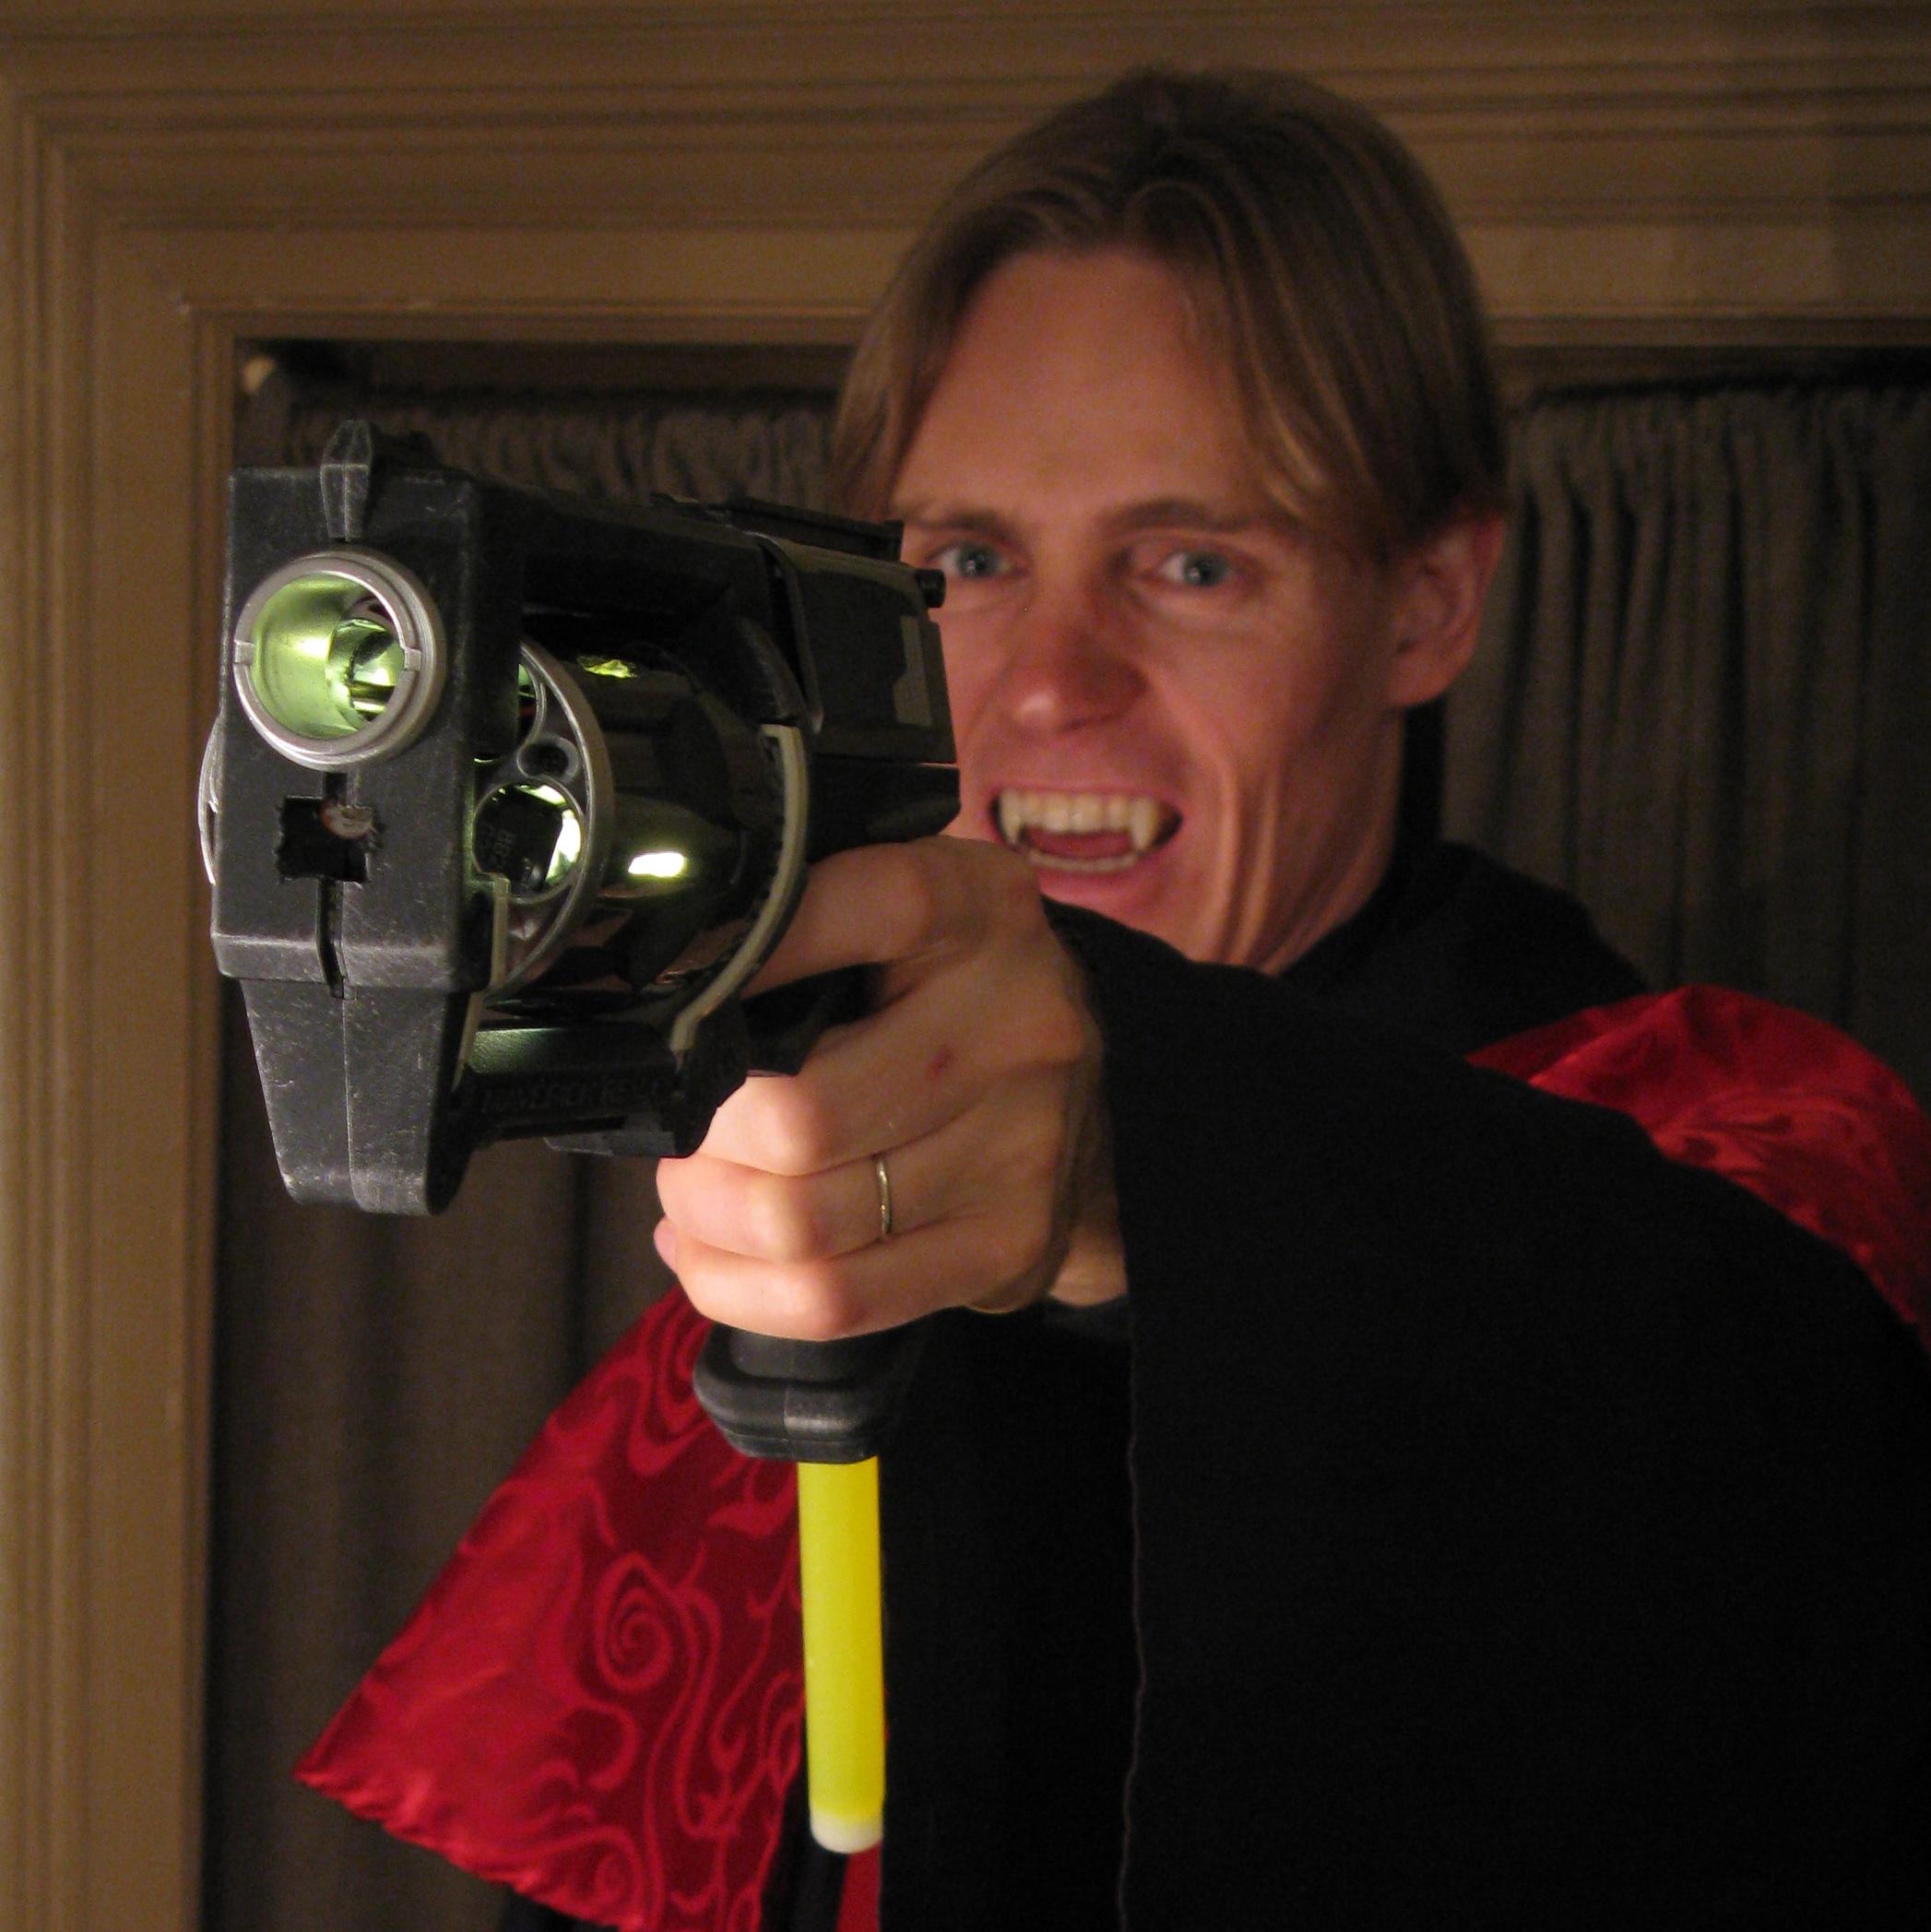 Vampire-Hunting Gun Prop with UV Bullets